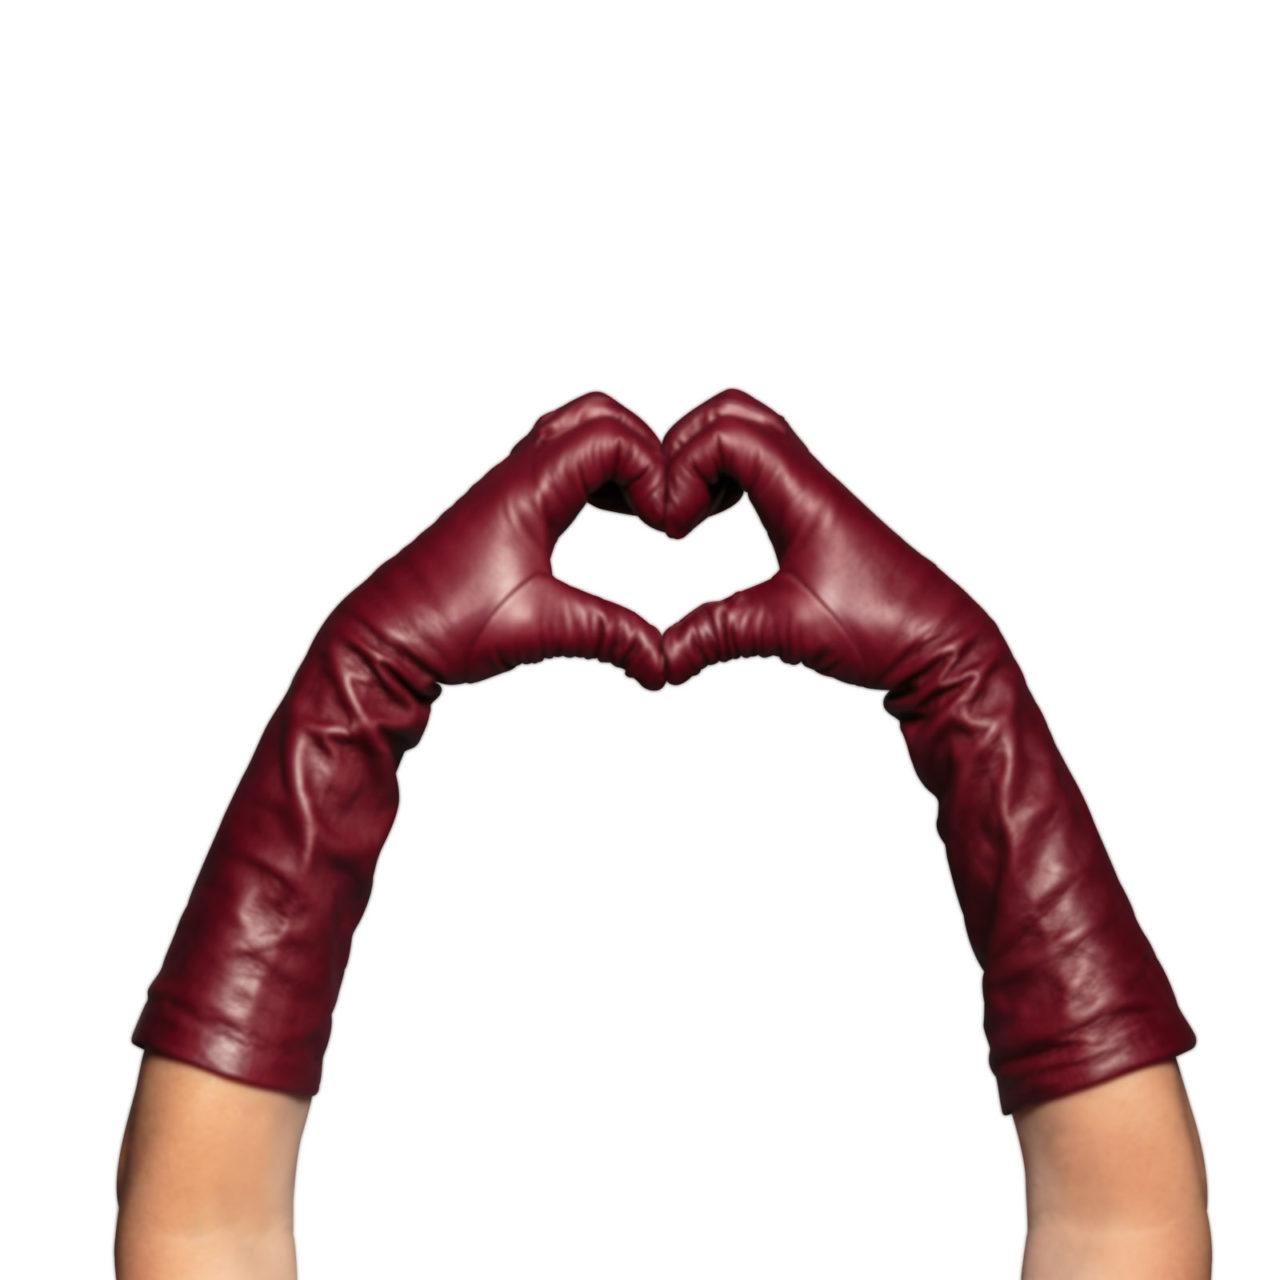 beau-gant-gloves-8-inch-long-dark-red-heart